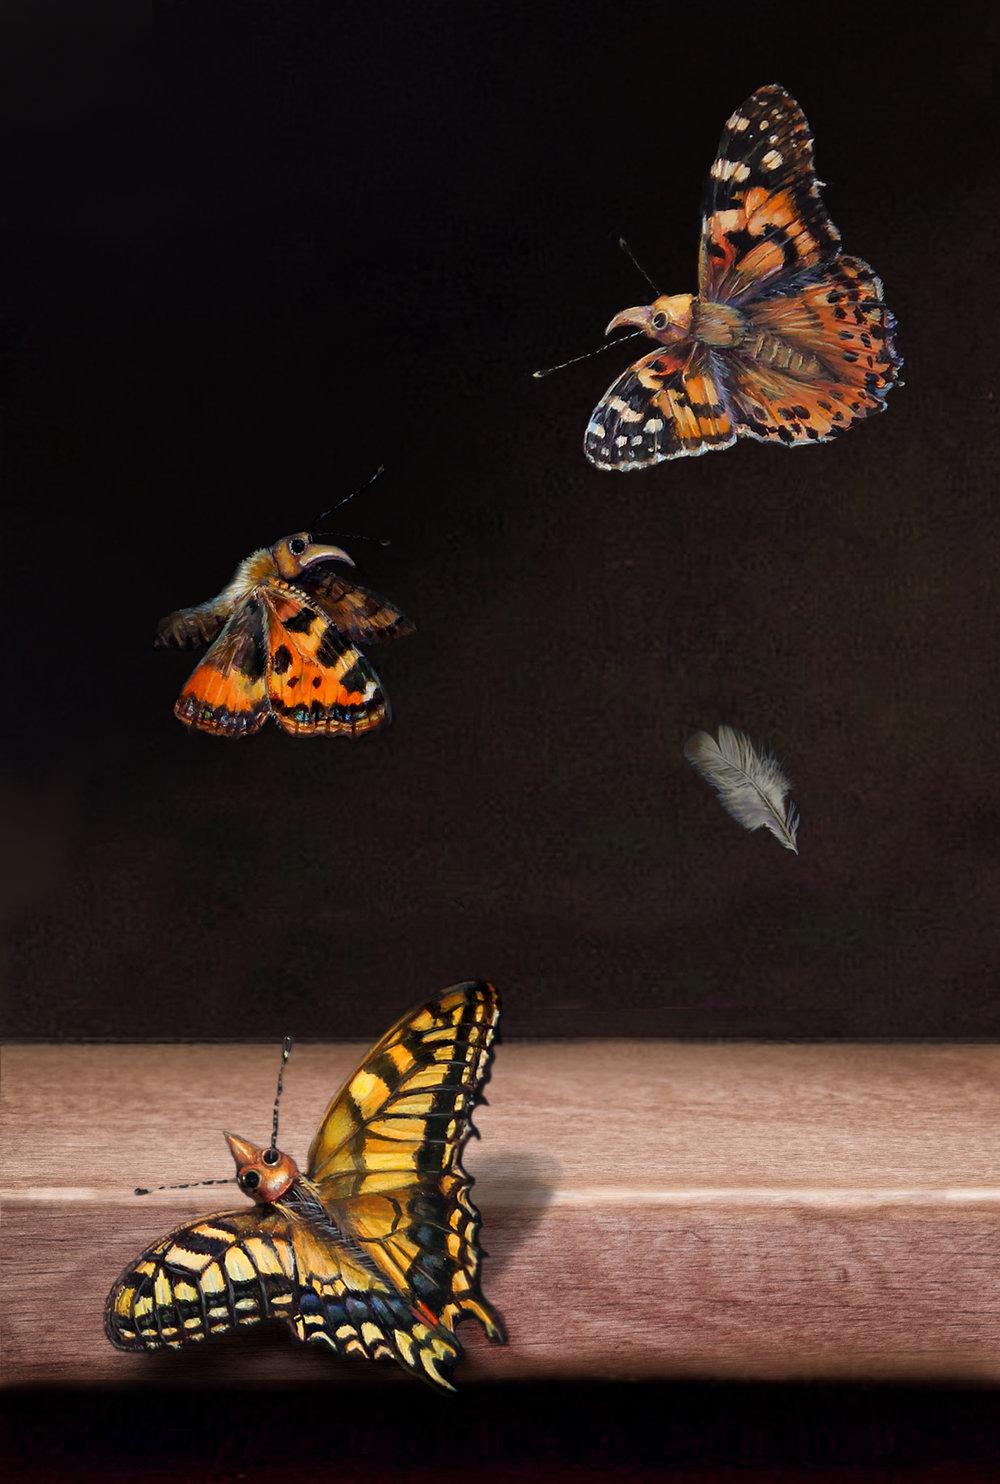 Hazel Mountford, Unnatural Order, Acrylic on wood, 32 x 22 x 2, http://hazelmountford.com/